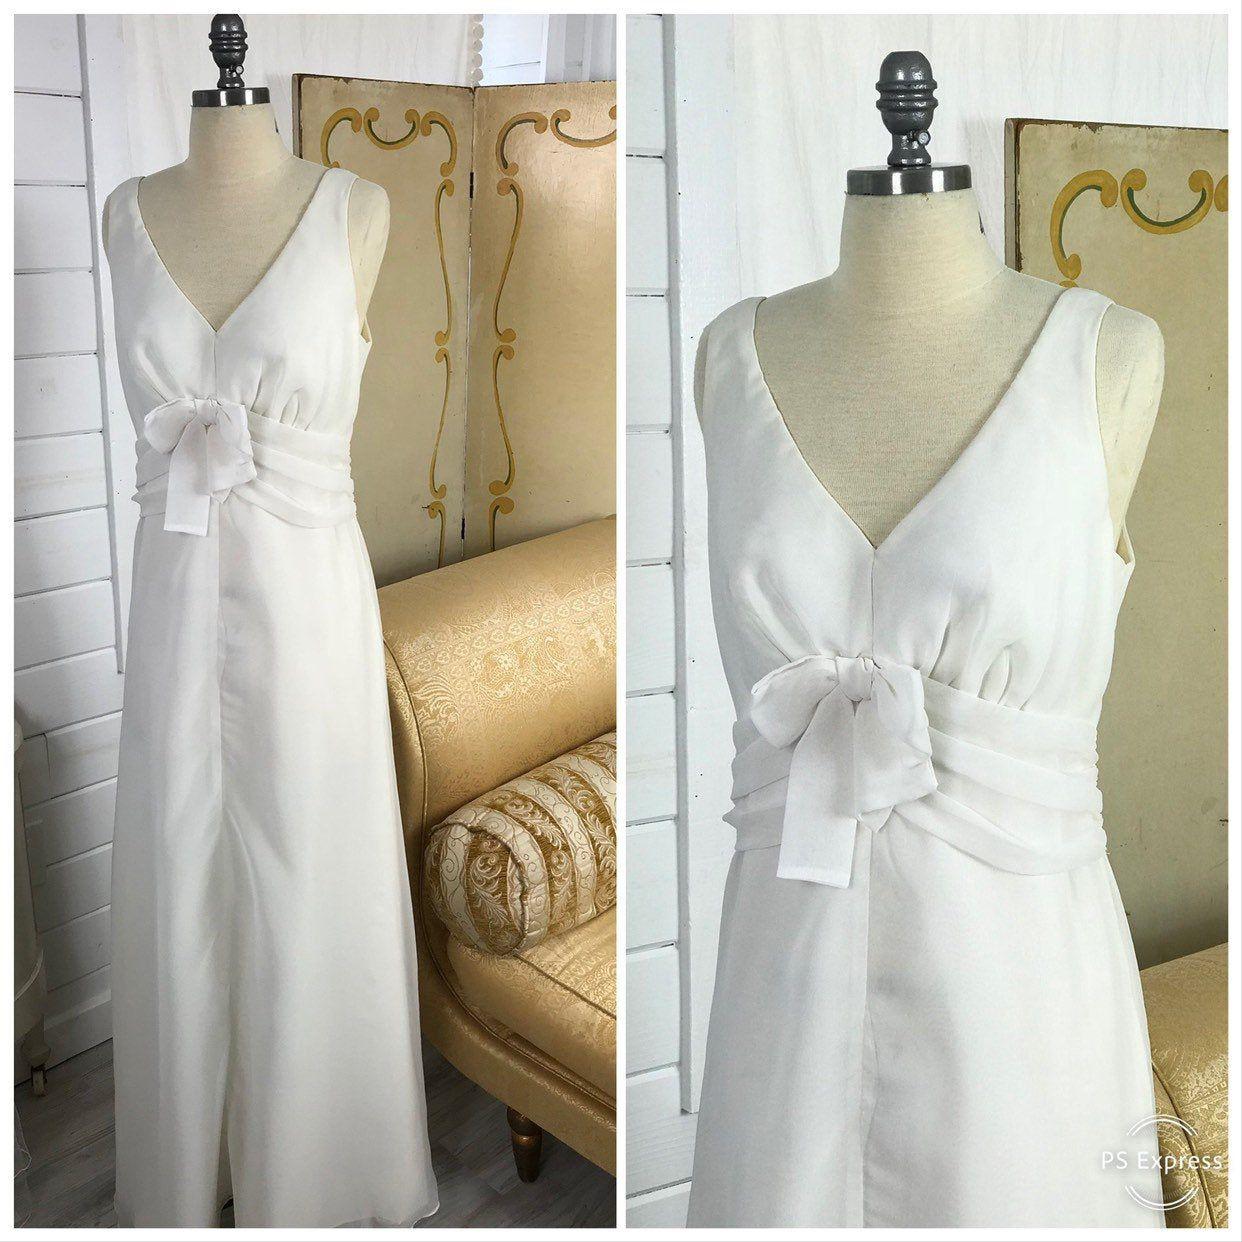 Pin on 1960s Wedding Dresses